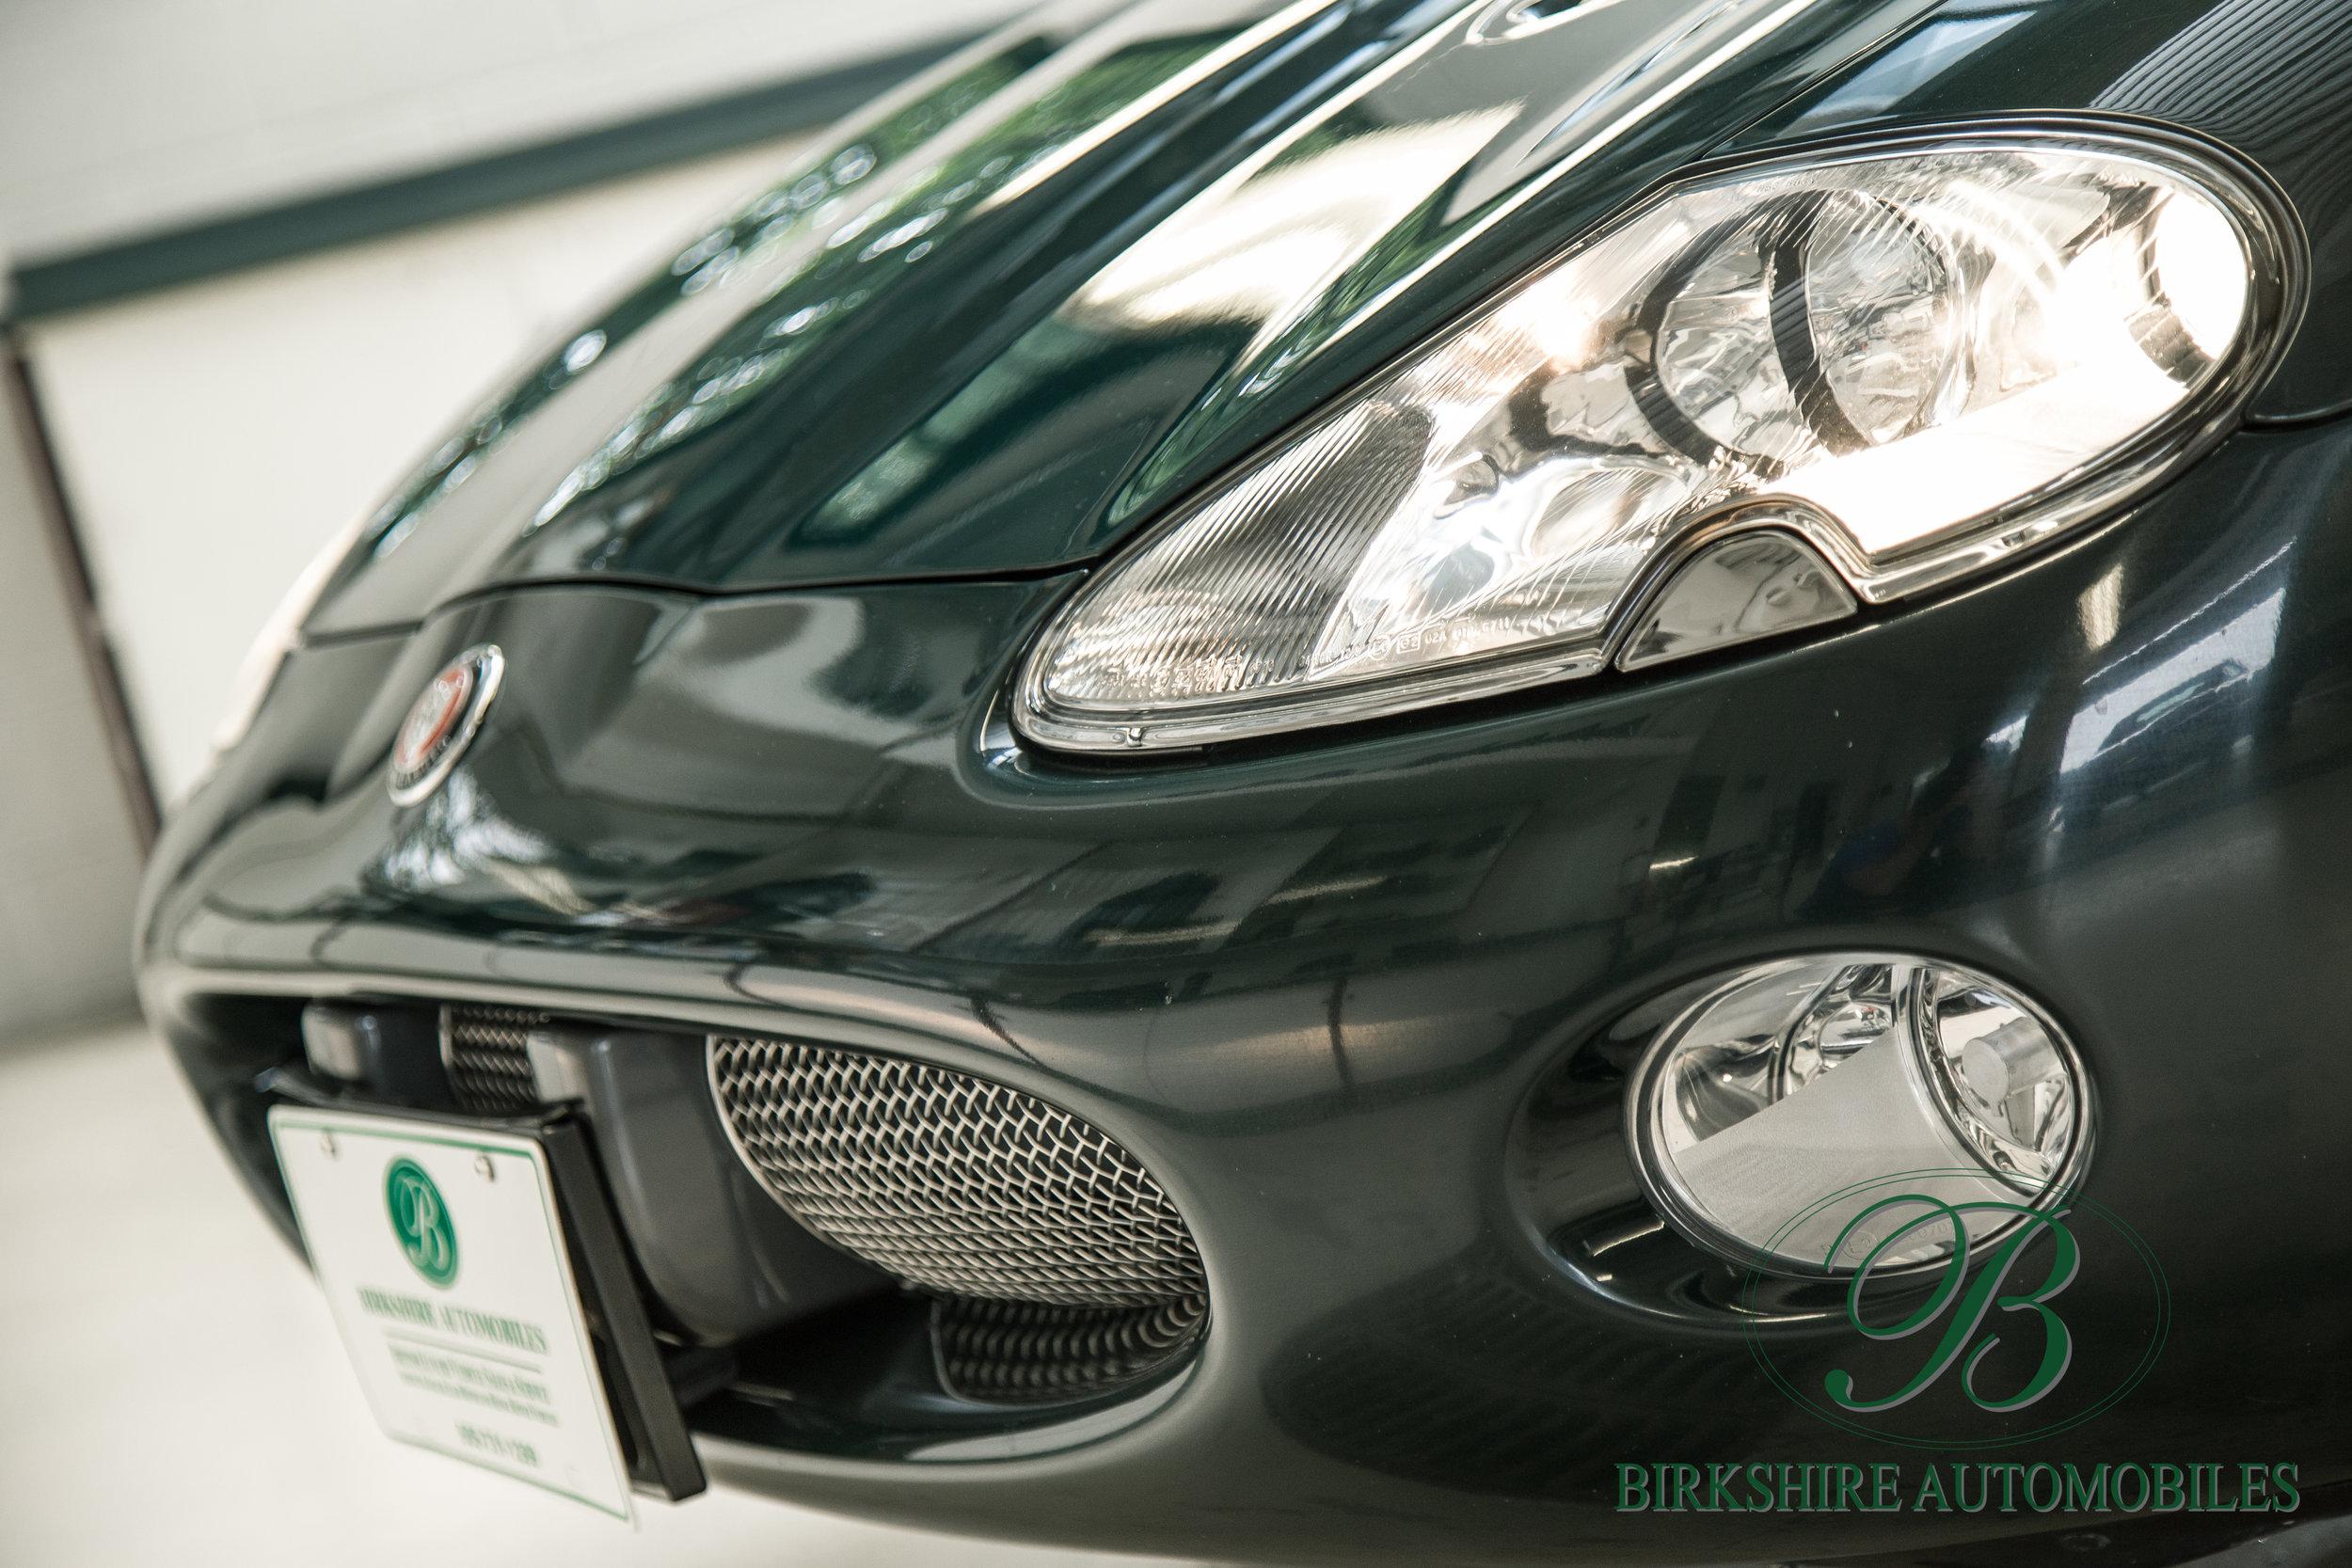 Birkshire Automobiles-114.jpg